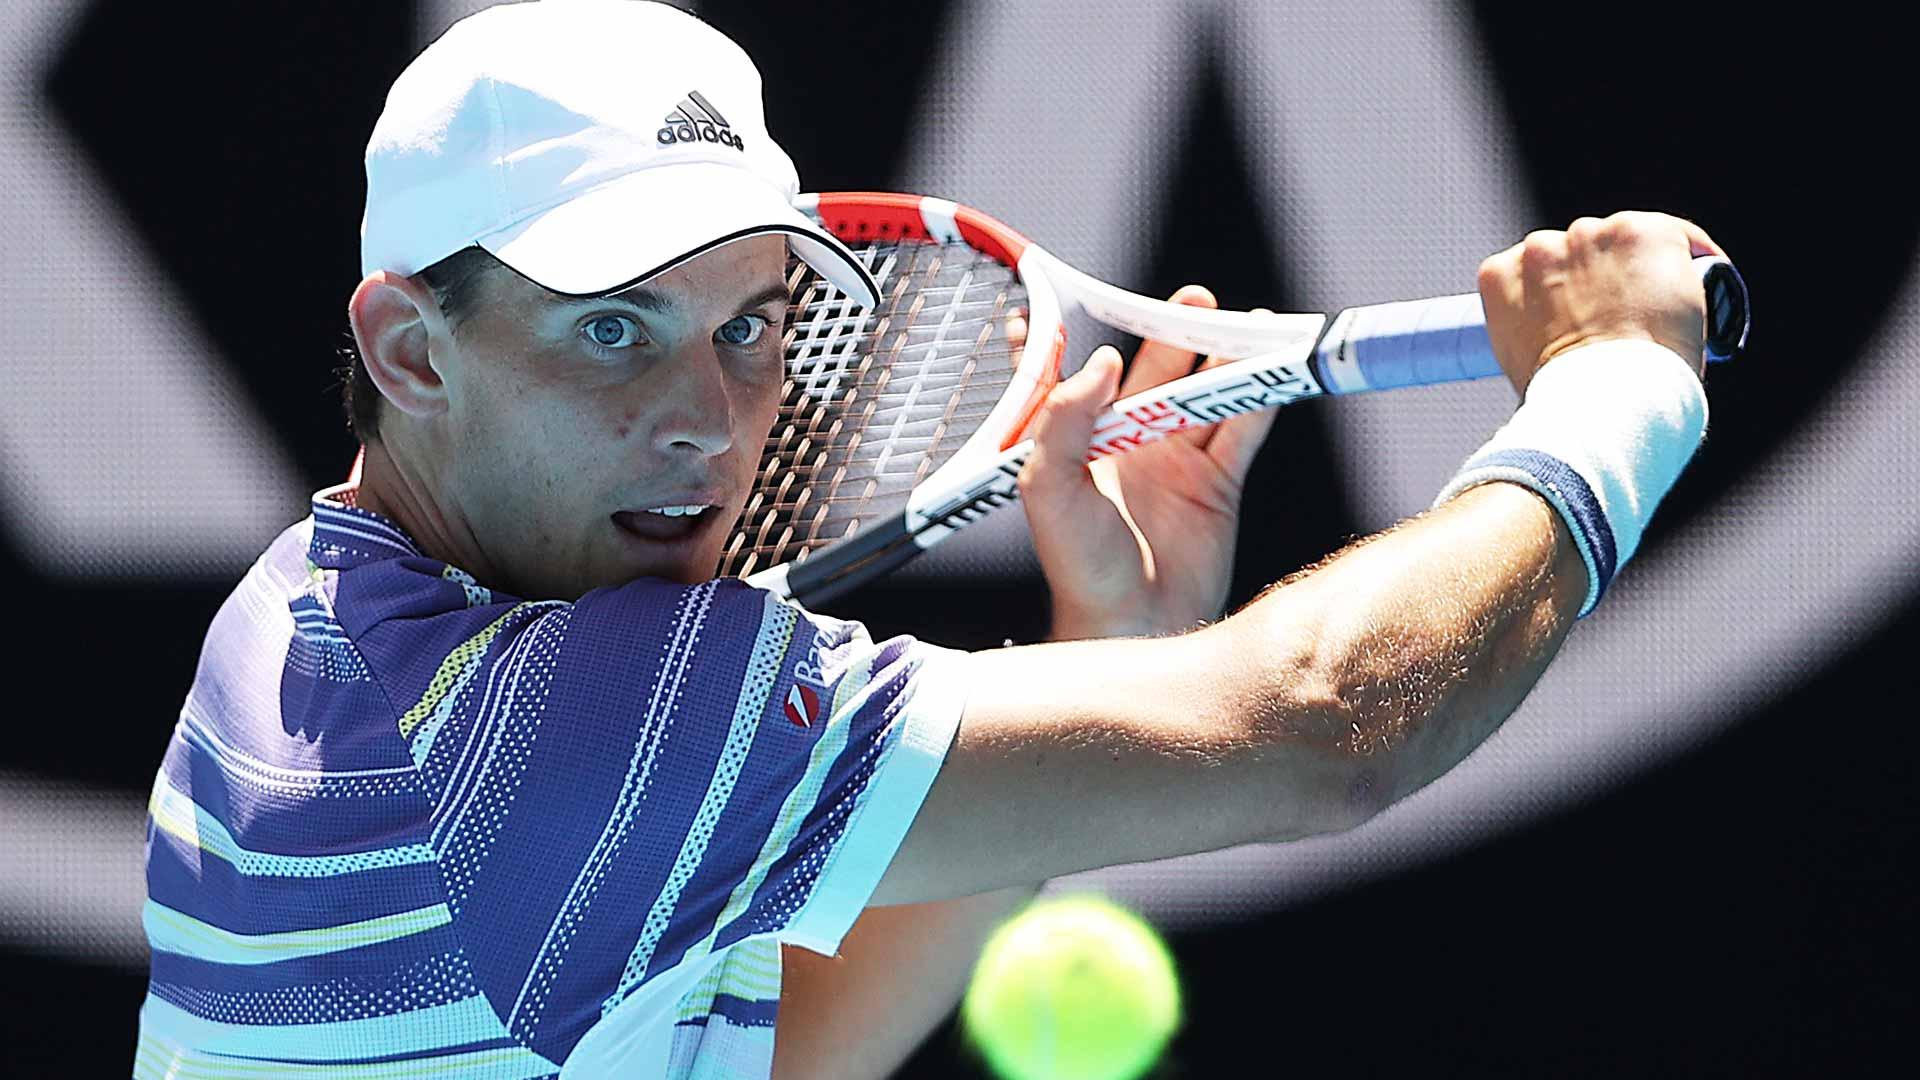 Thiem <a href='https://www.atptour.com/en/tournaments/australian-open/580/overview'>Australian Open</a> 2020 Tuesday